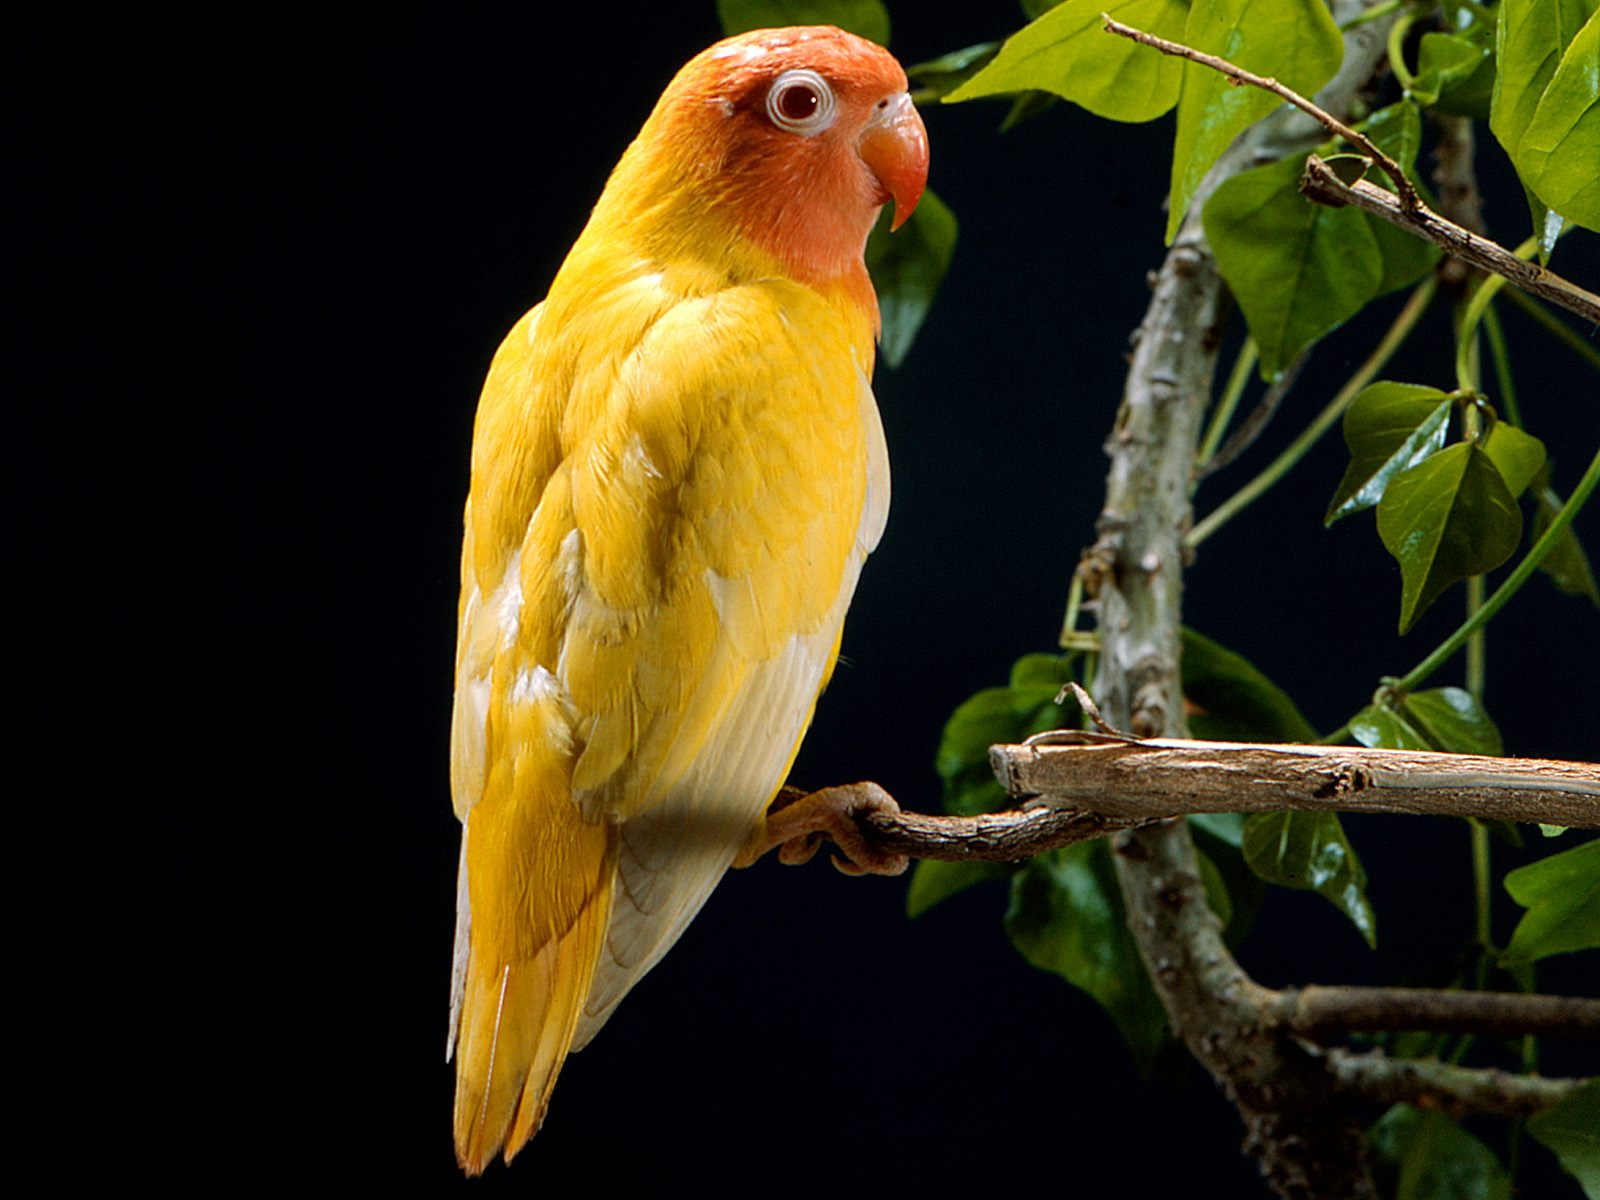 Wallpapers Love Birds: See Animal And Birds: Love Bird Wallpaper